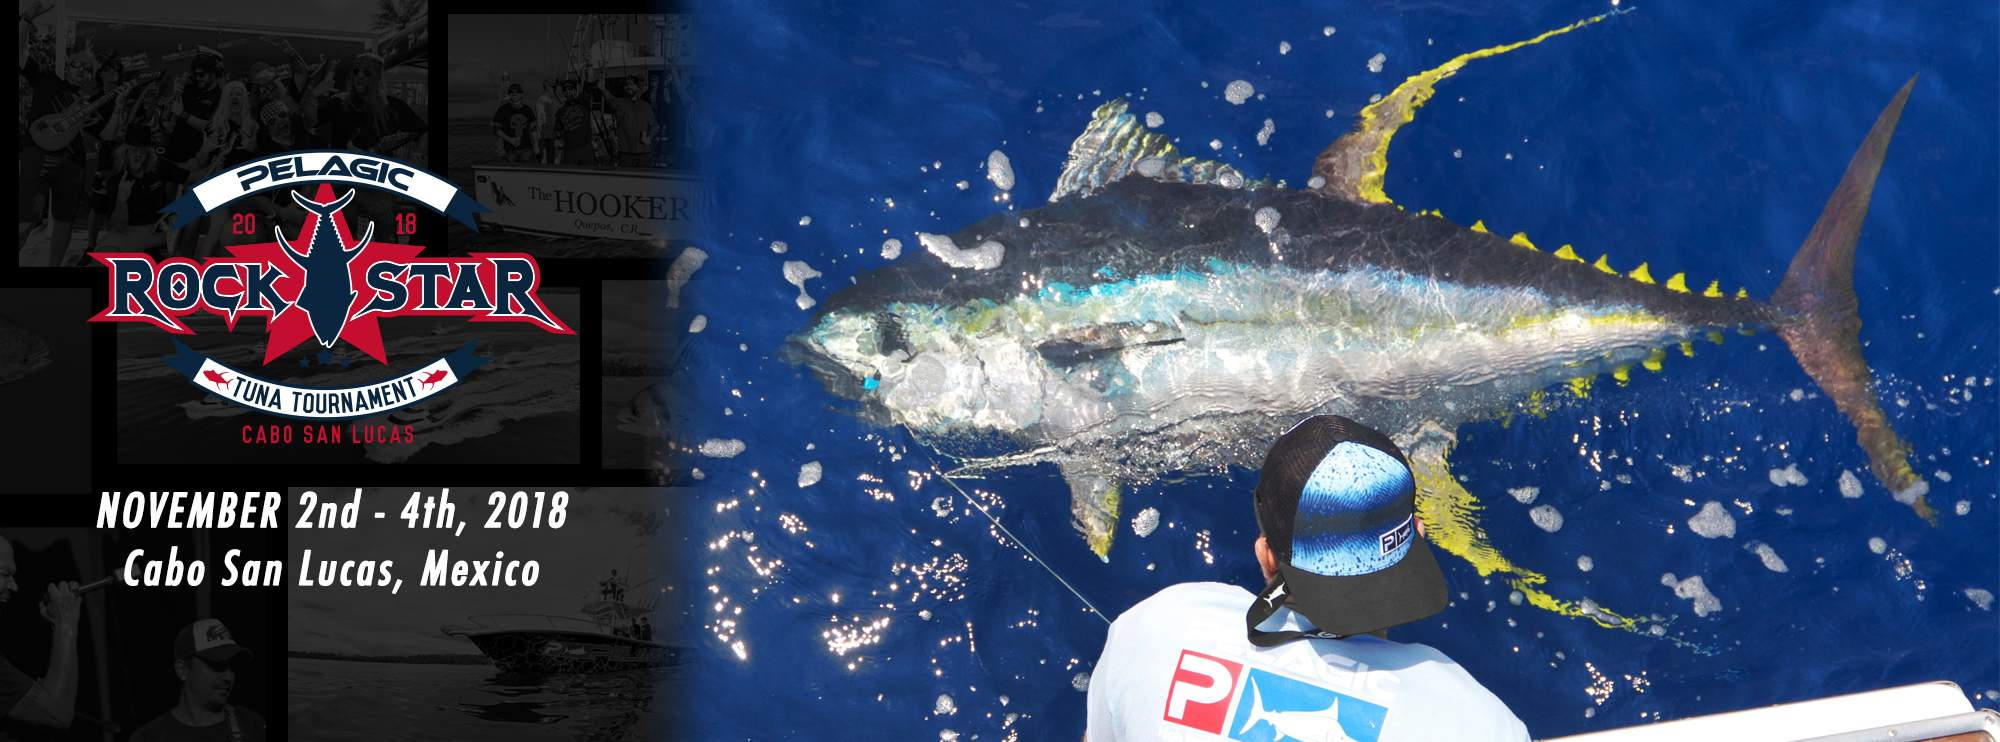 Pelagic Tuna Tournament Cabo San Lucas header